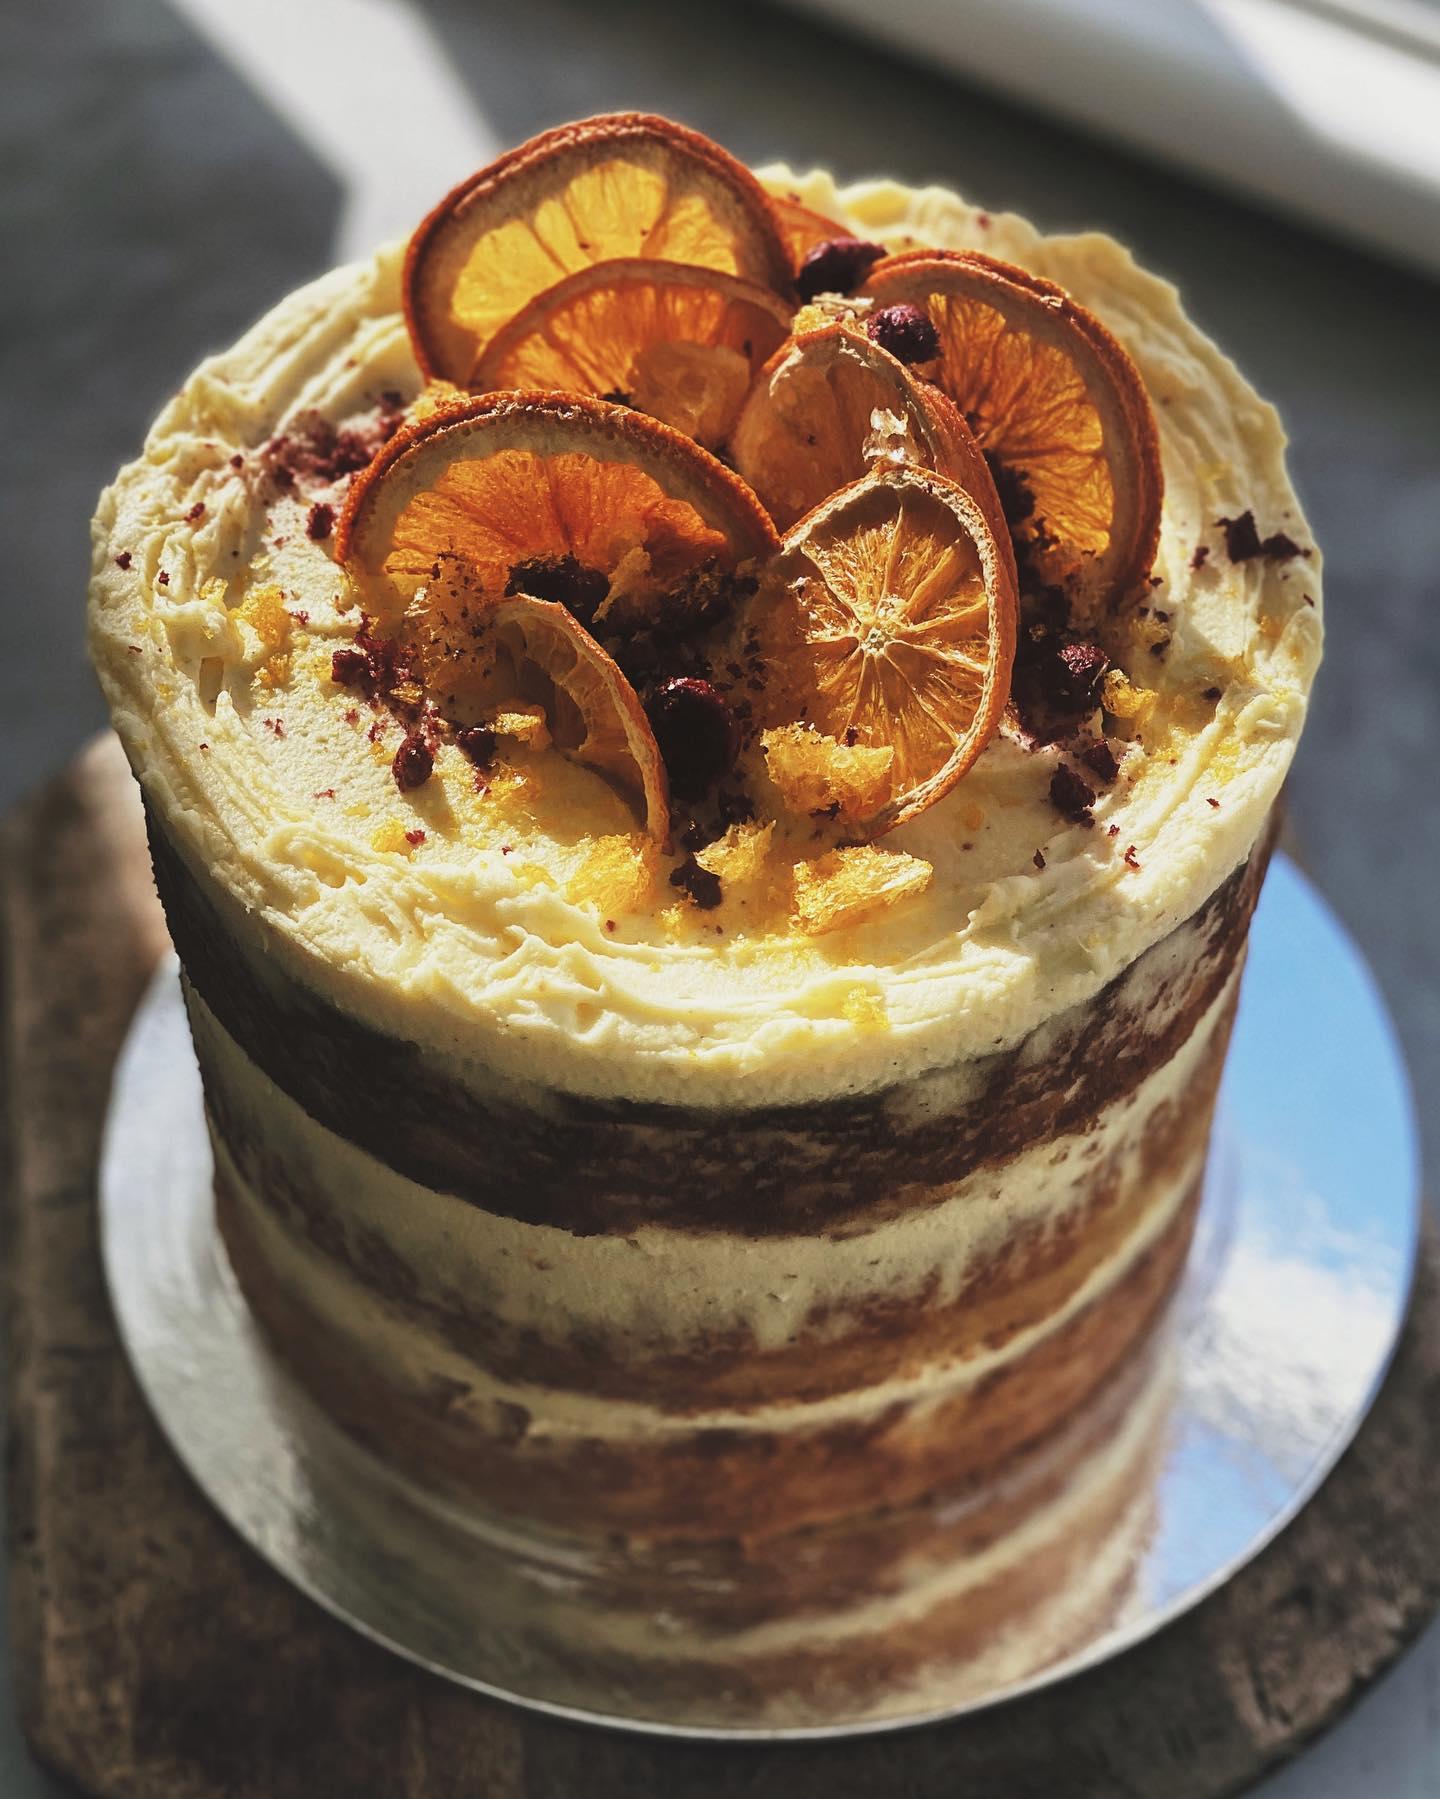 nsw sydney wedding cake designer cakes weddings